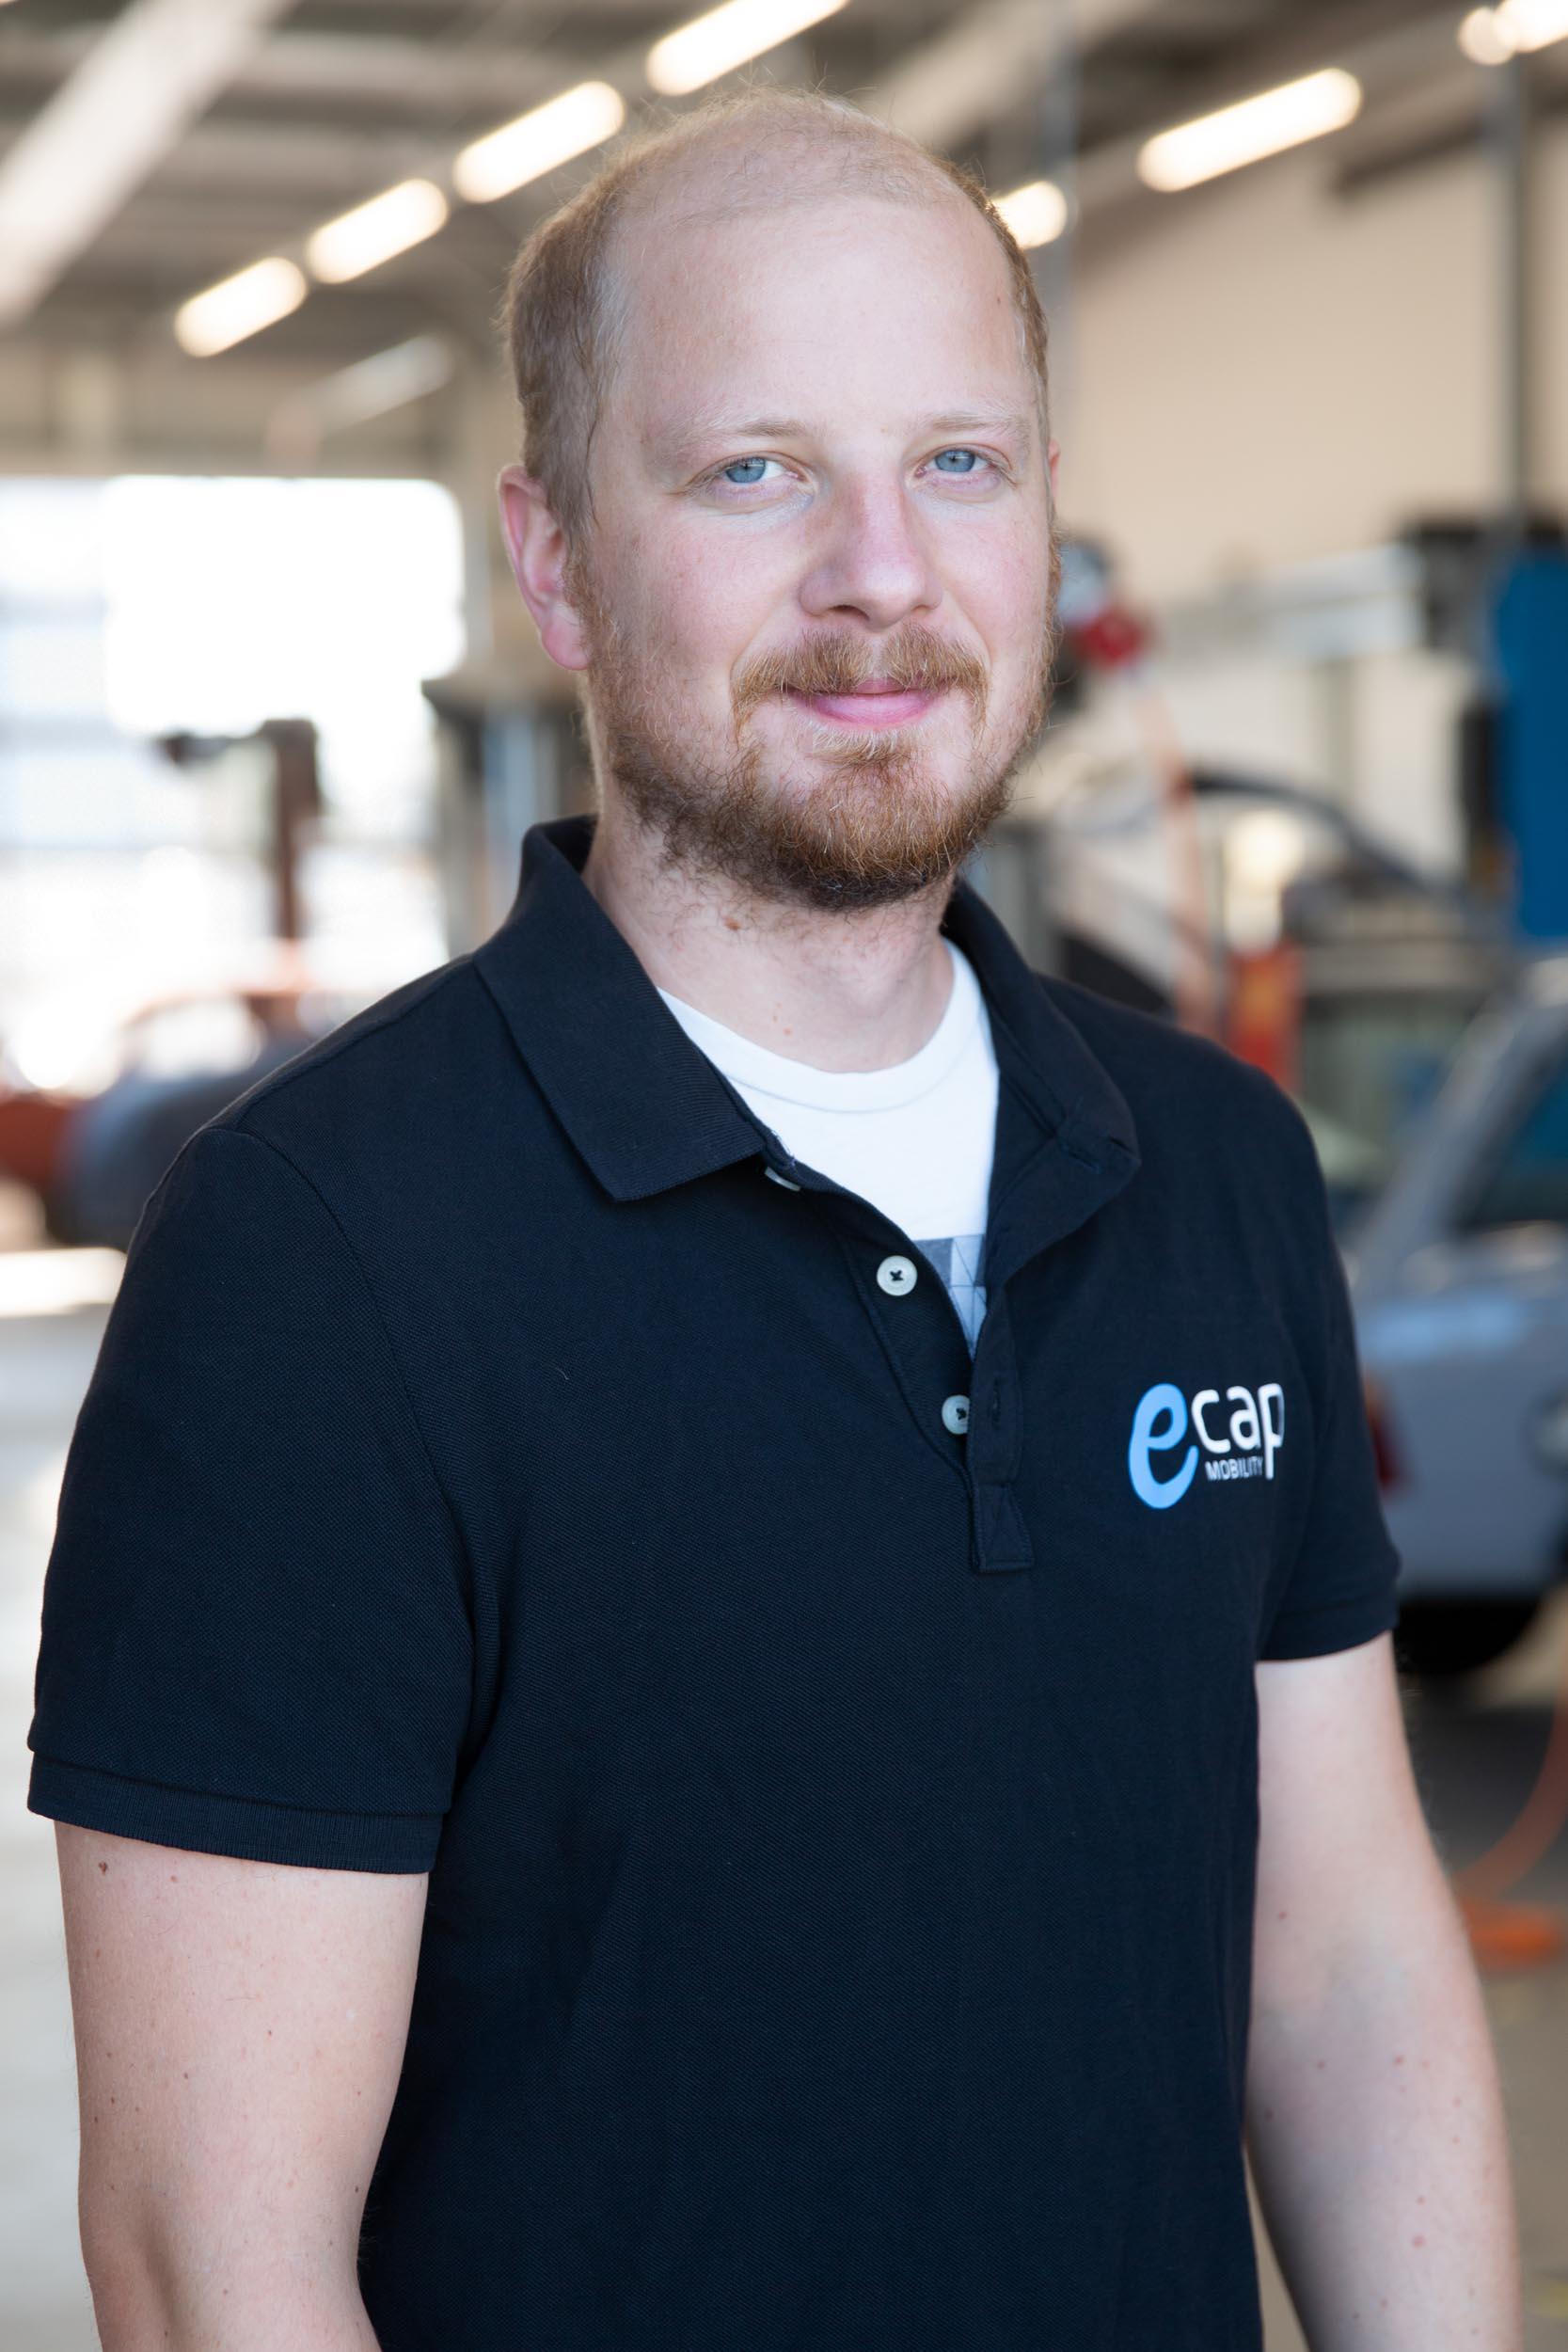 Martin Pruscha | Software Development mpr@ecap-mobility.com